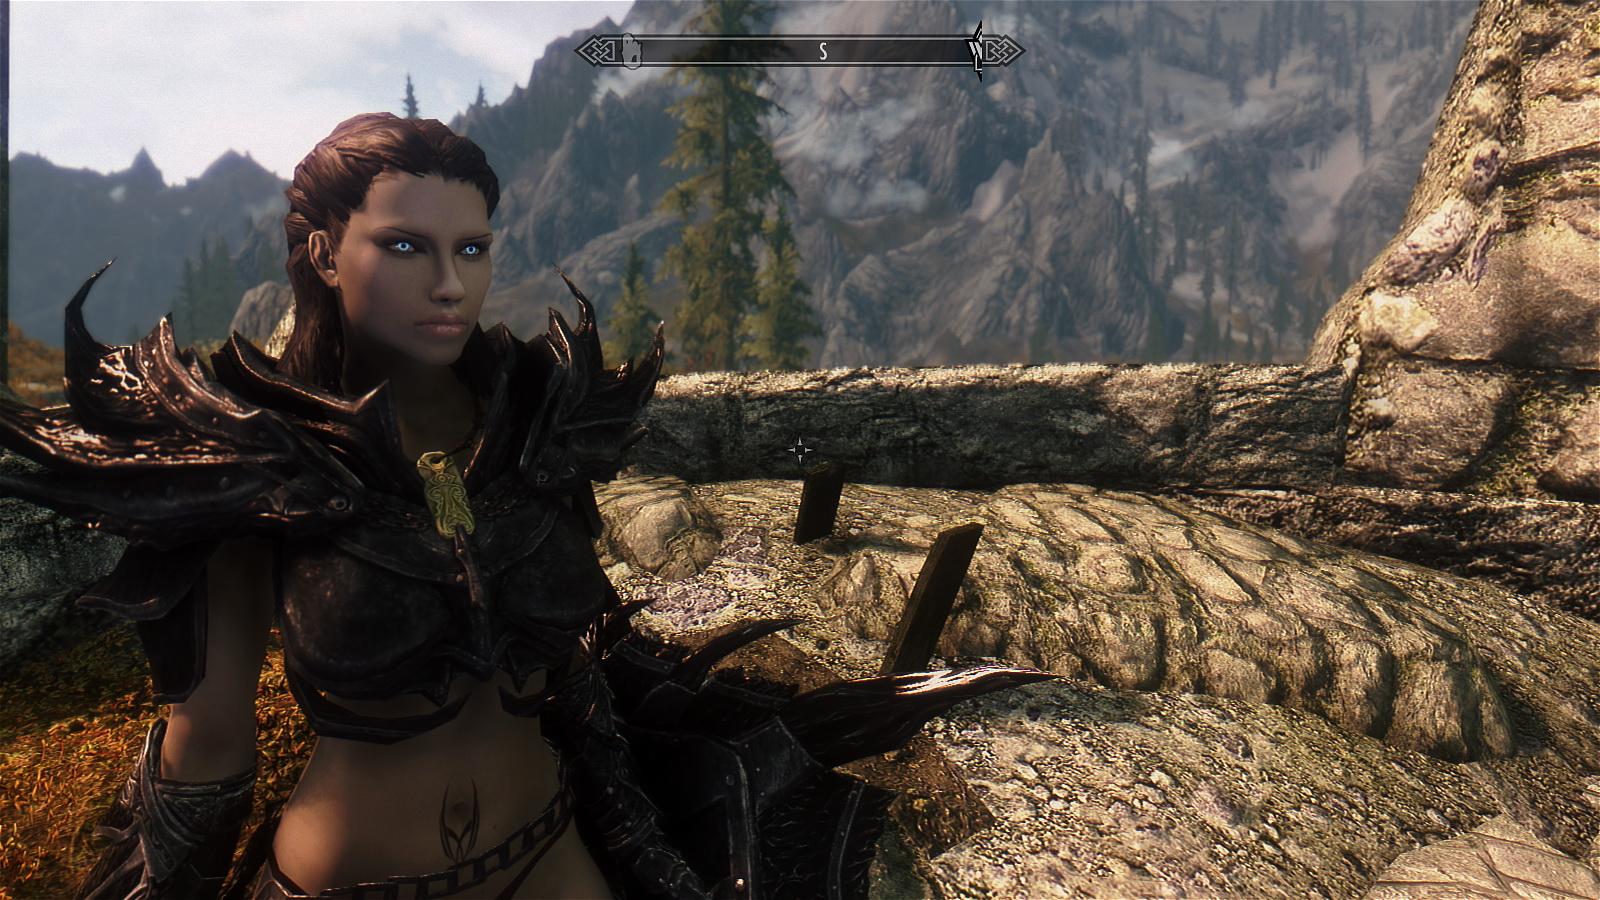 Screenshot1852.jpg - Elder Scrolls 5: Skyrim, the